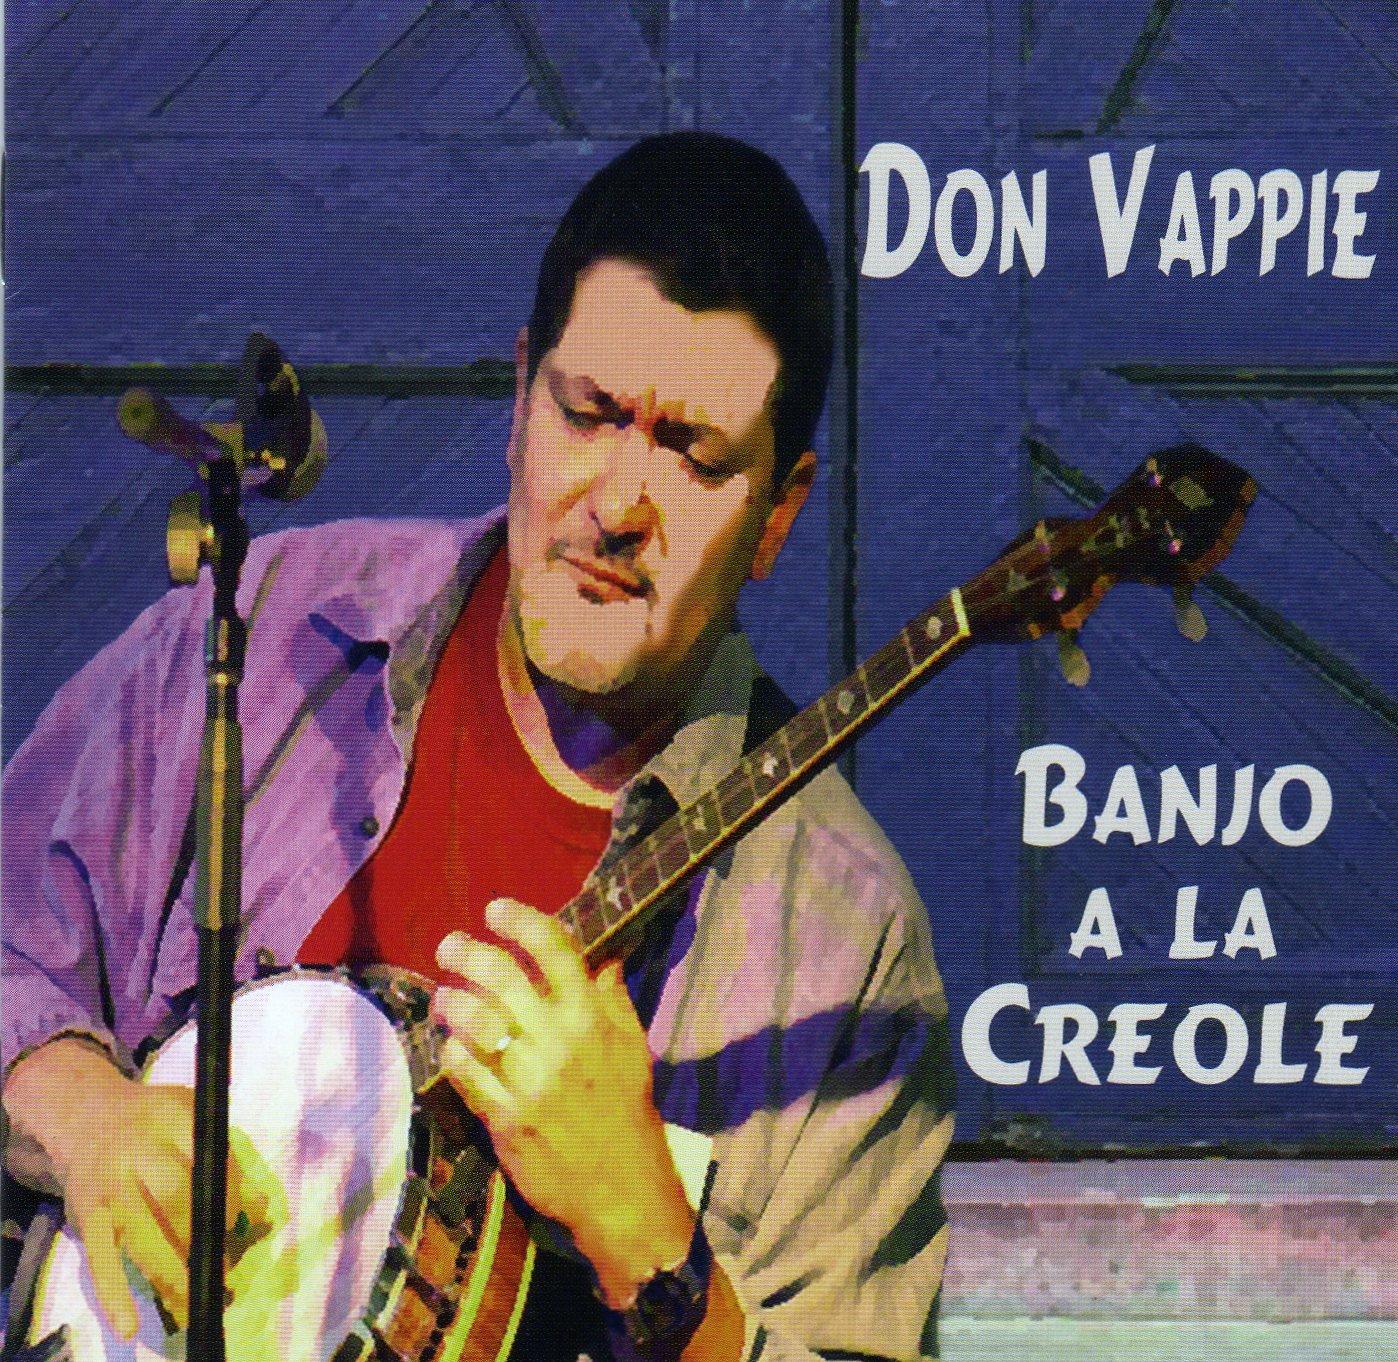 Banjo A La Creole